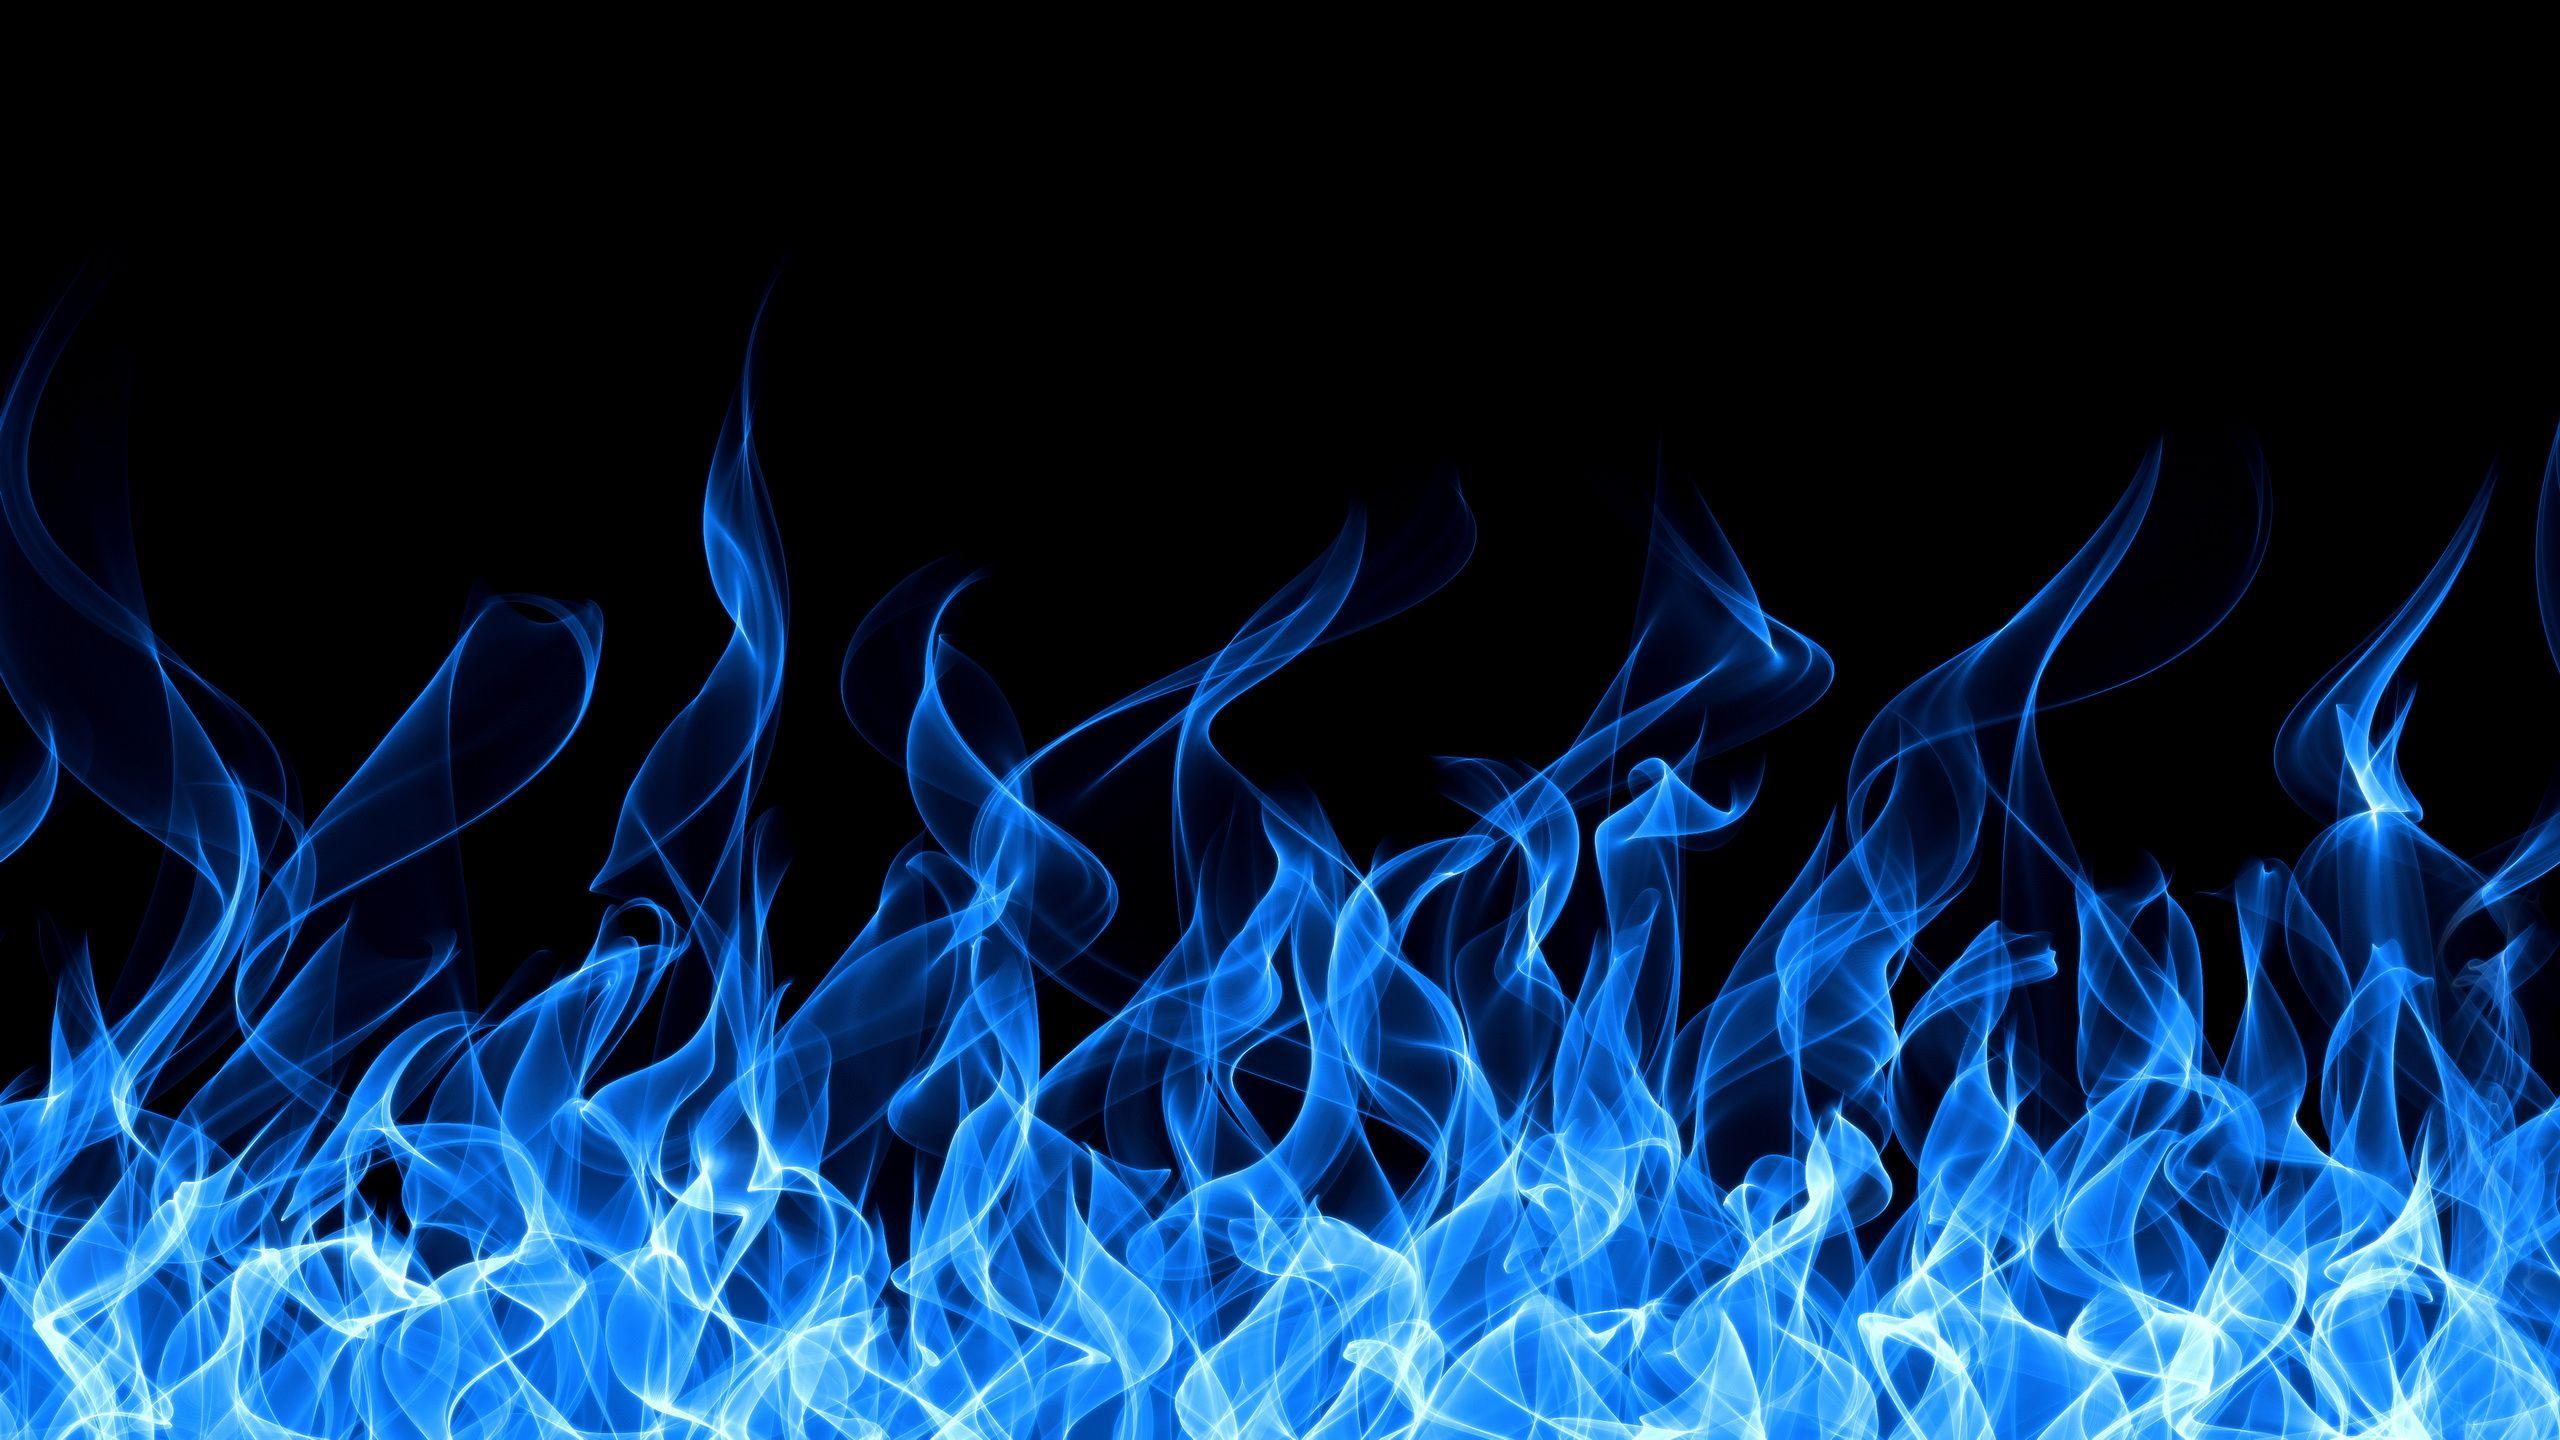 Blue Fire Wallpaper Hd Best Wallpaper Hd Blue Flames Eyes Wallpaper Black Background Images